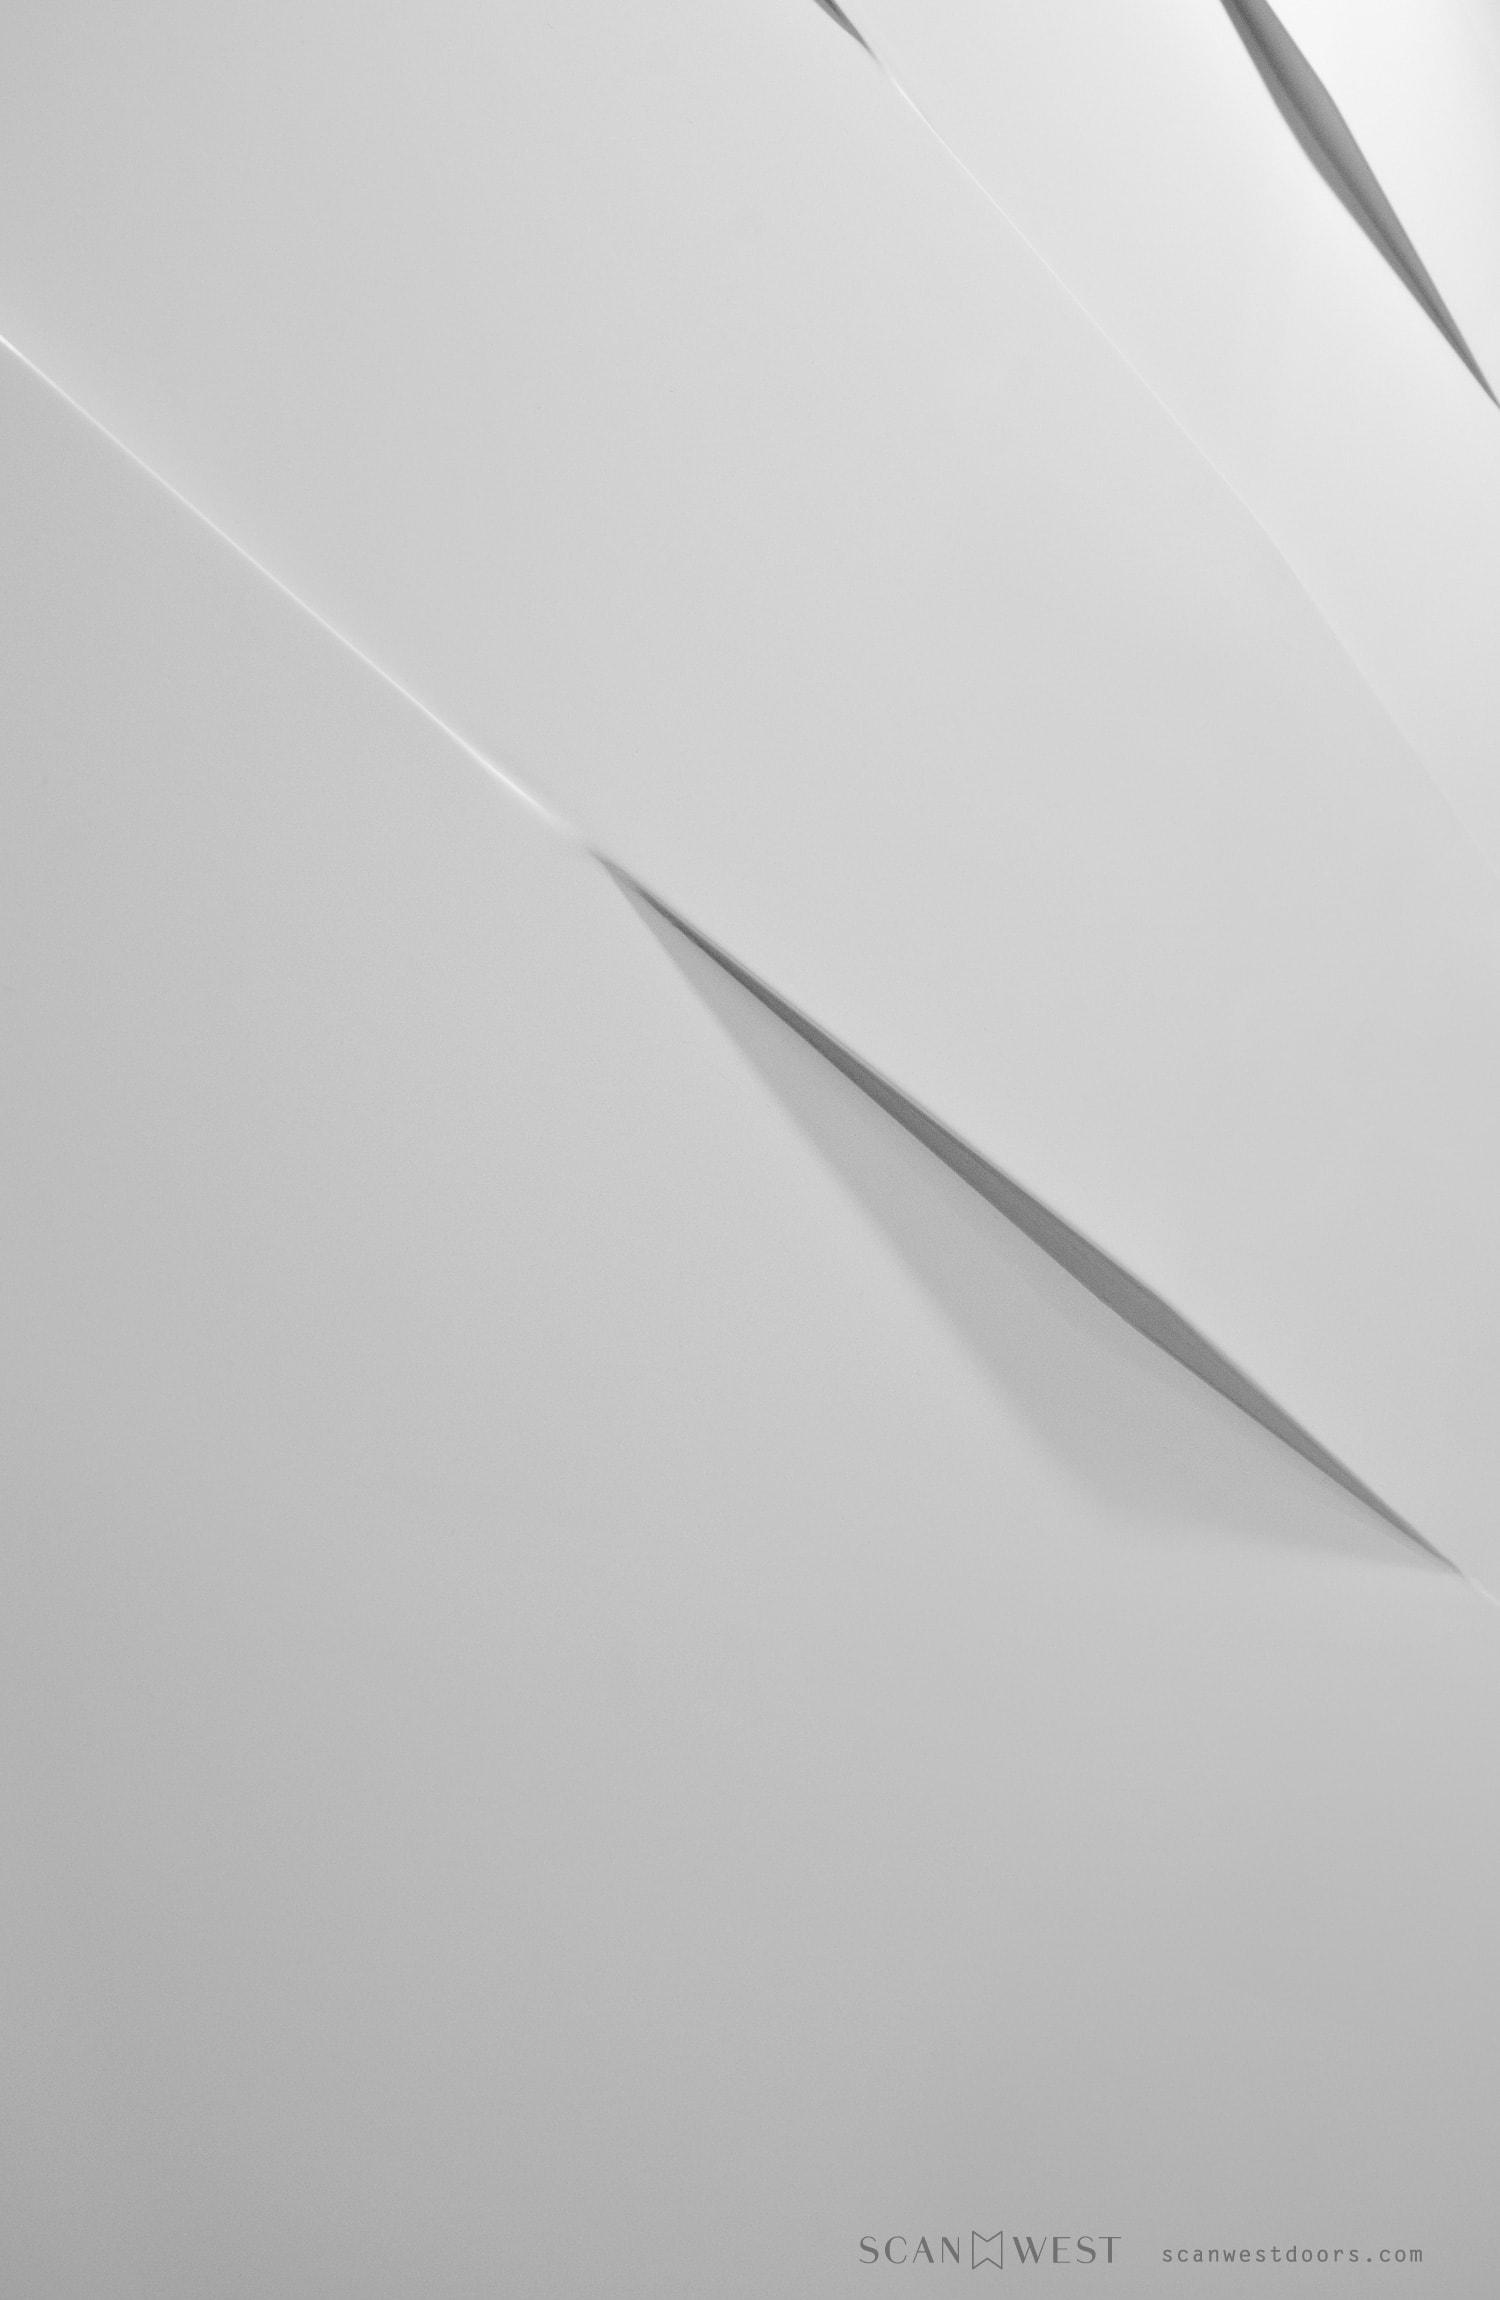 TRIANGLE-Door-Modern-Contemporary-Texture-Luxury-1500x2300